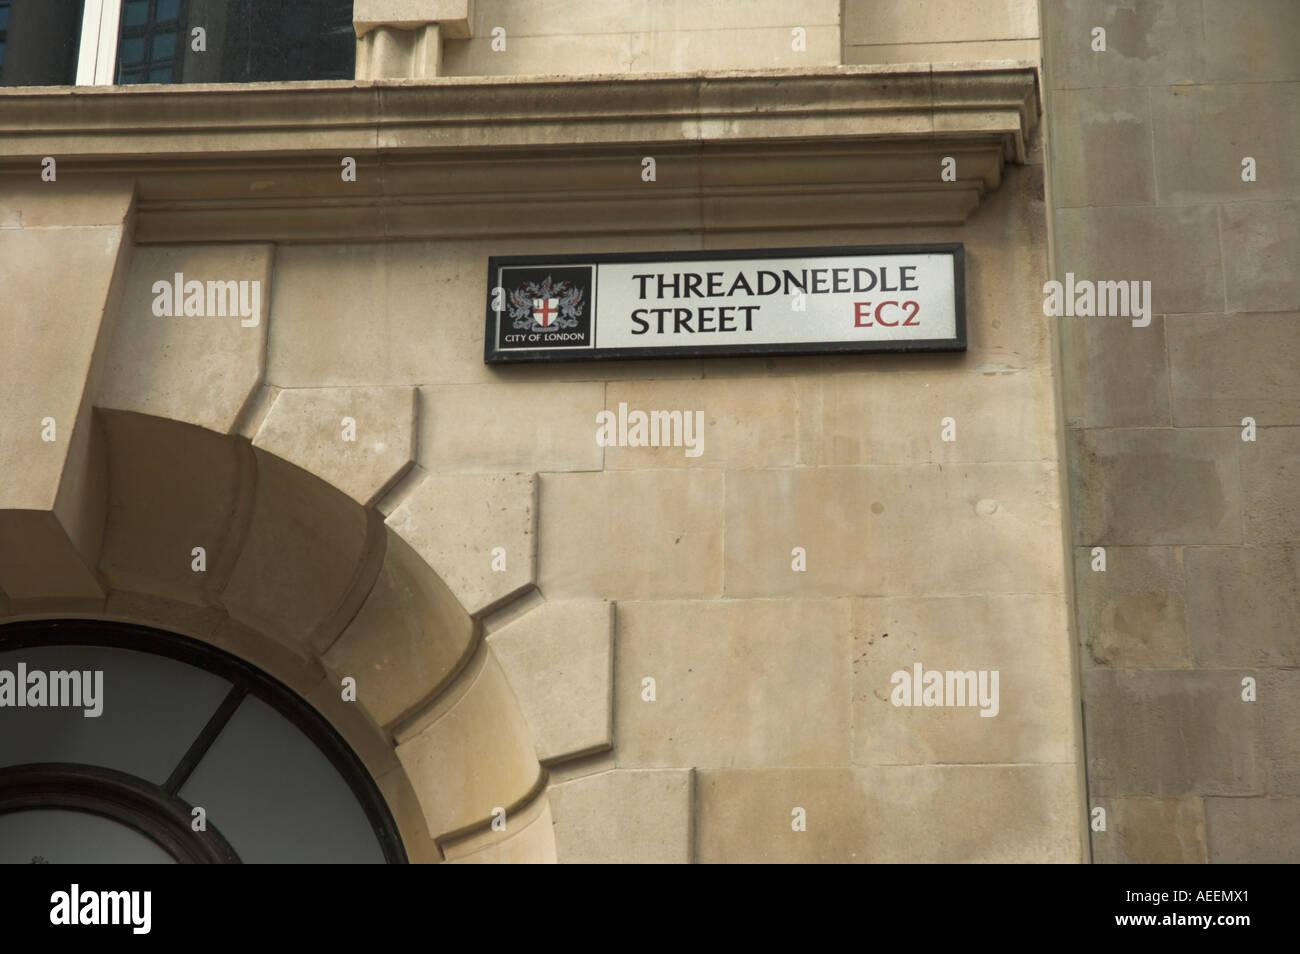 Road sign Threadneedle Street London EC2 in Banking Area Bank of England UK - Stock Image